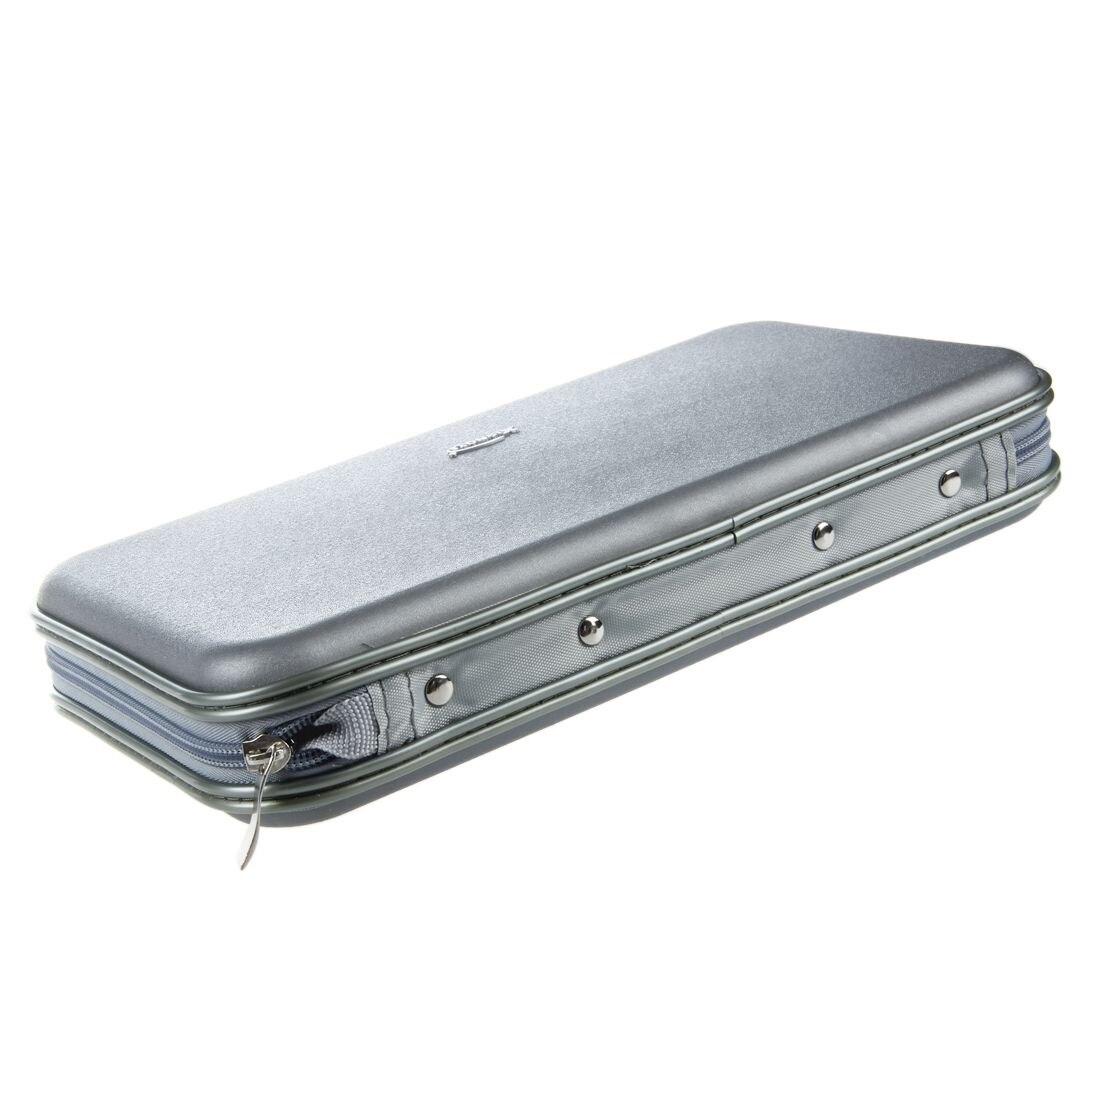 HFES New Xiongye Binder Storage Box Pouch Case Range 80 DVD CD Bag Plastic Bag